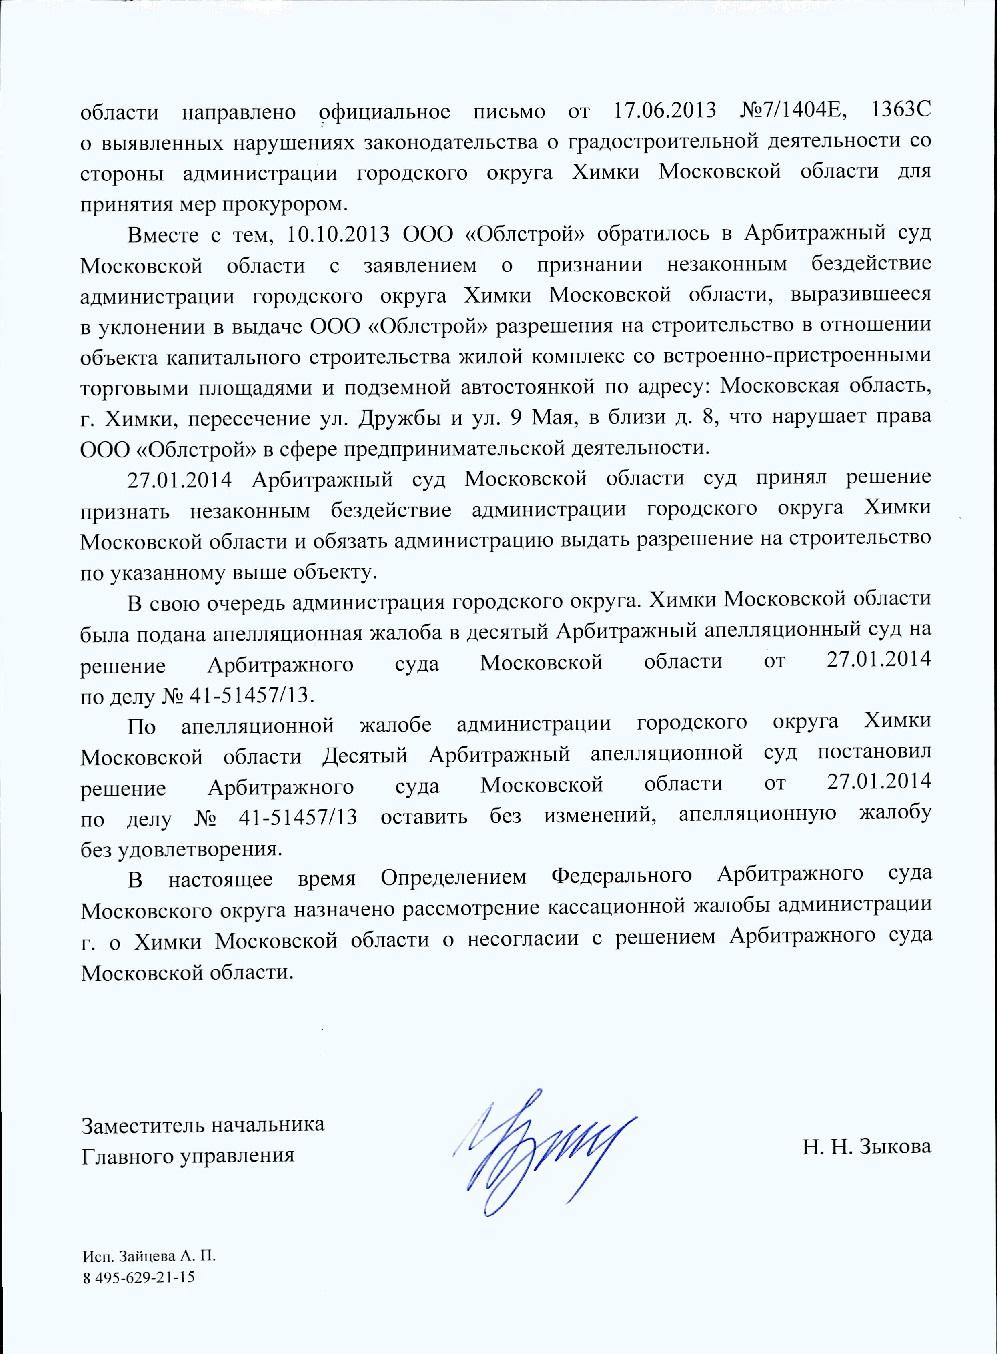 05-2014-Главарх2